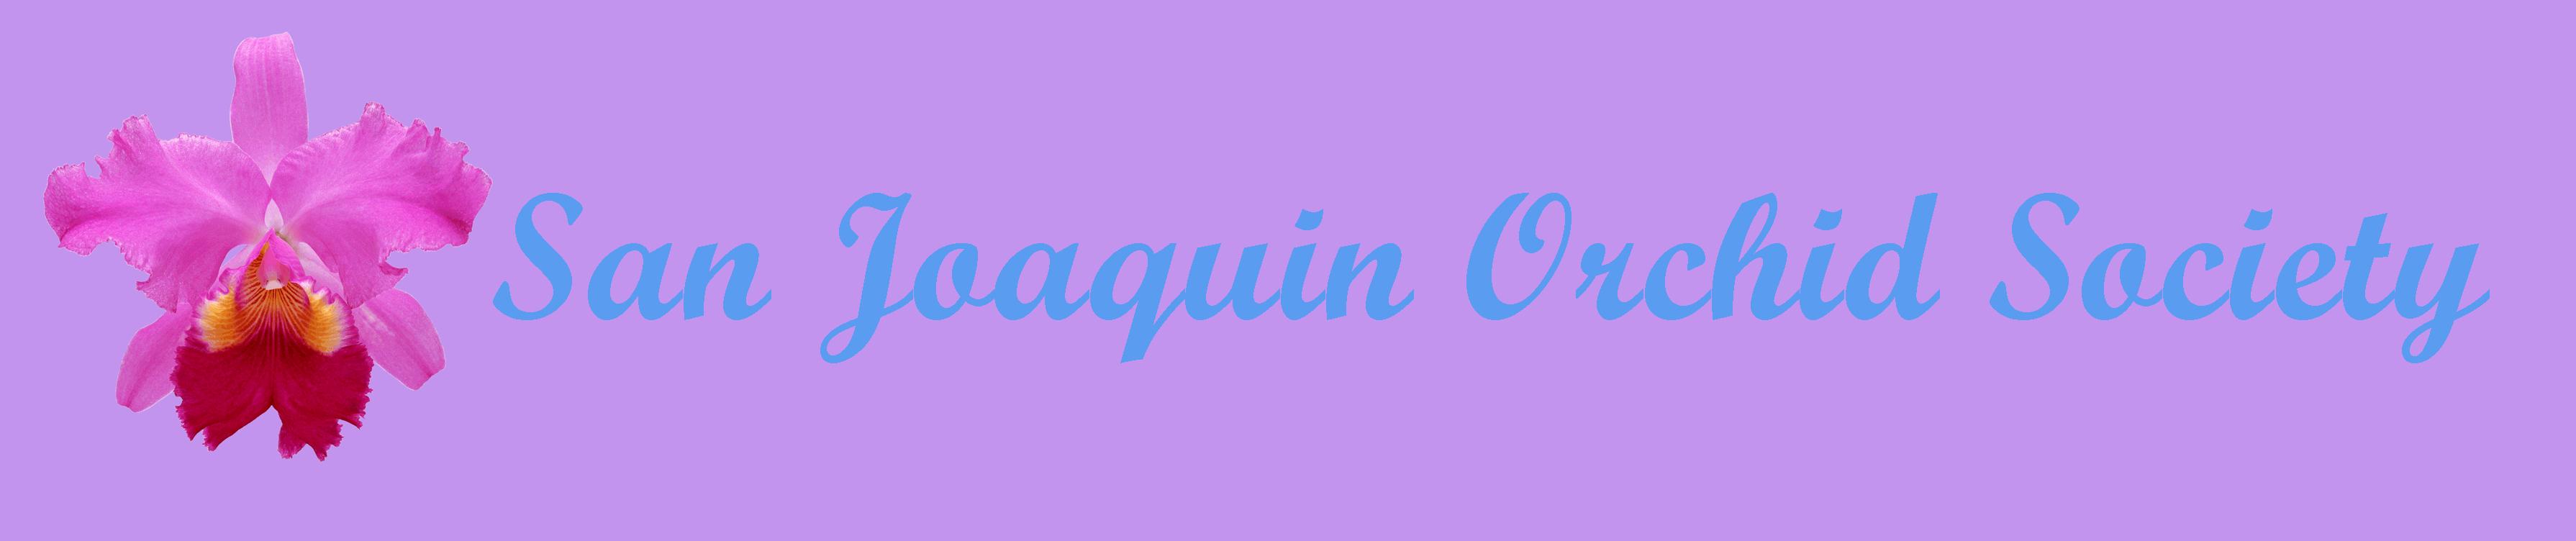 San Joaquin Orchid Society